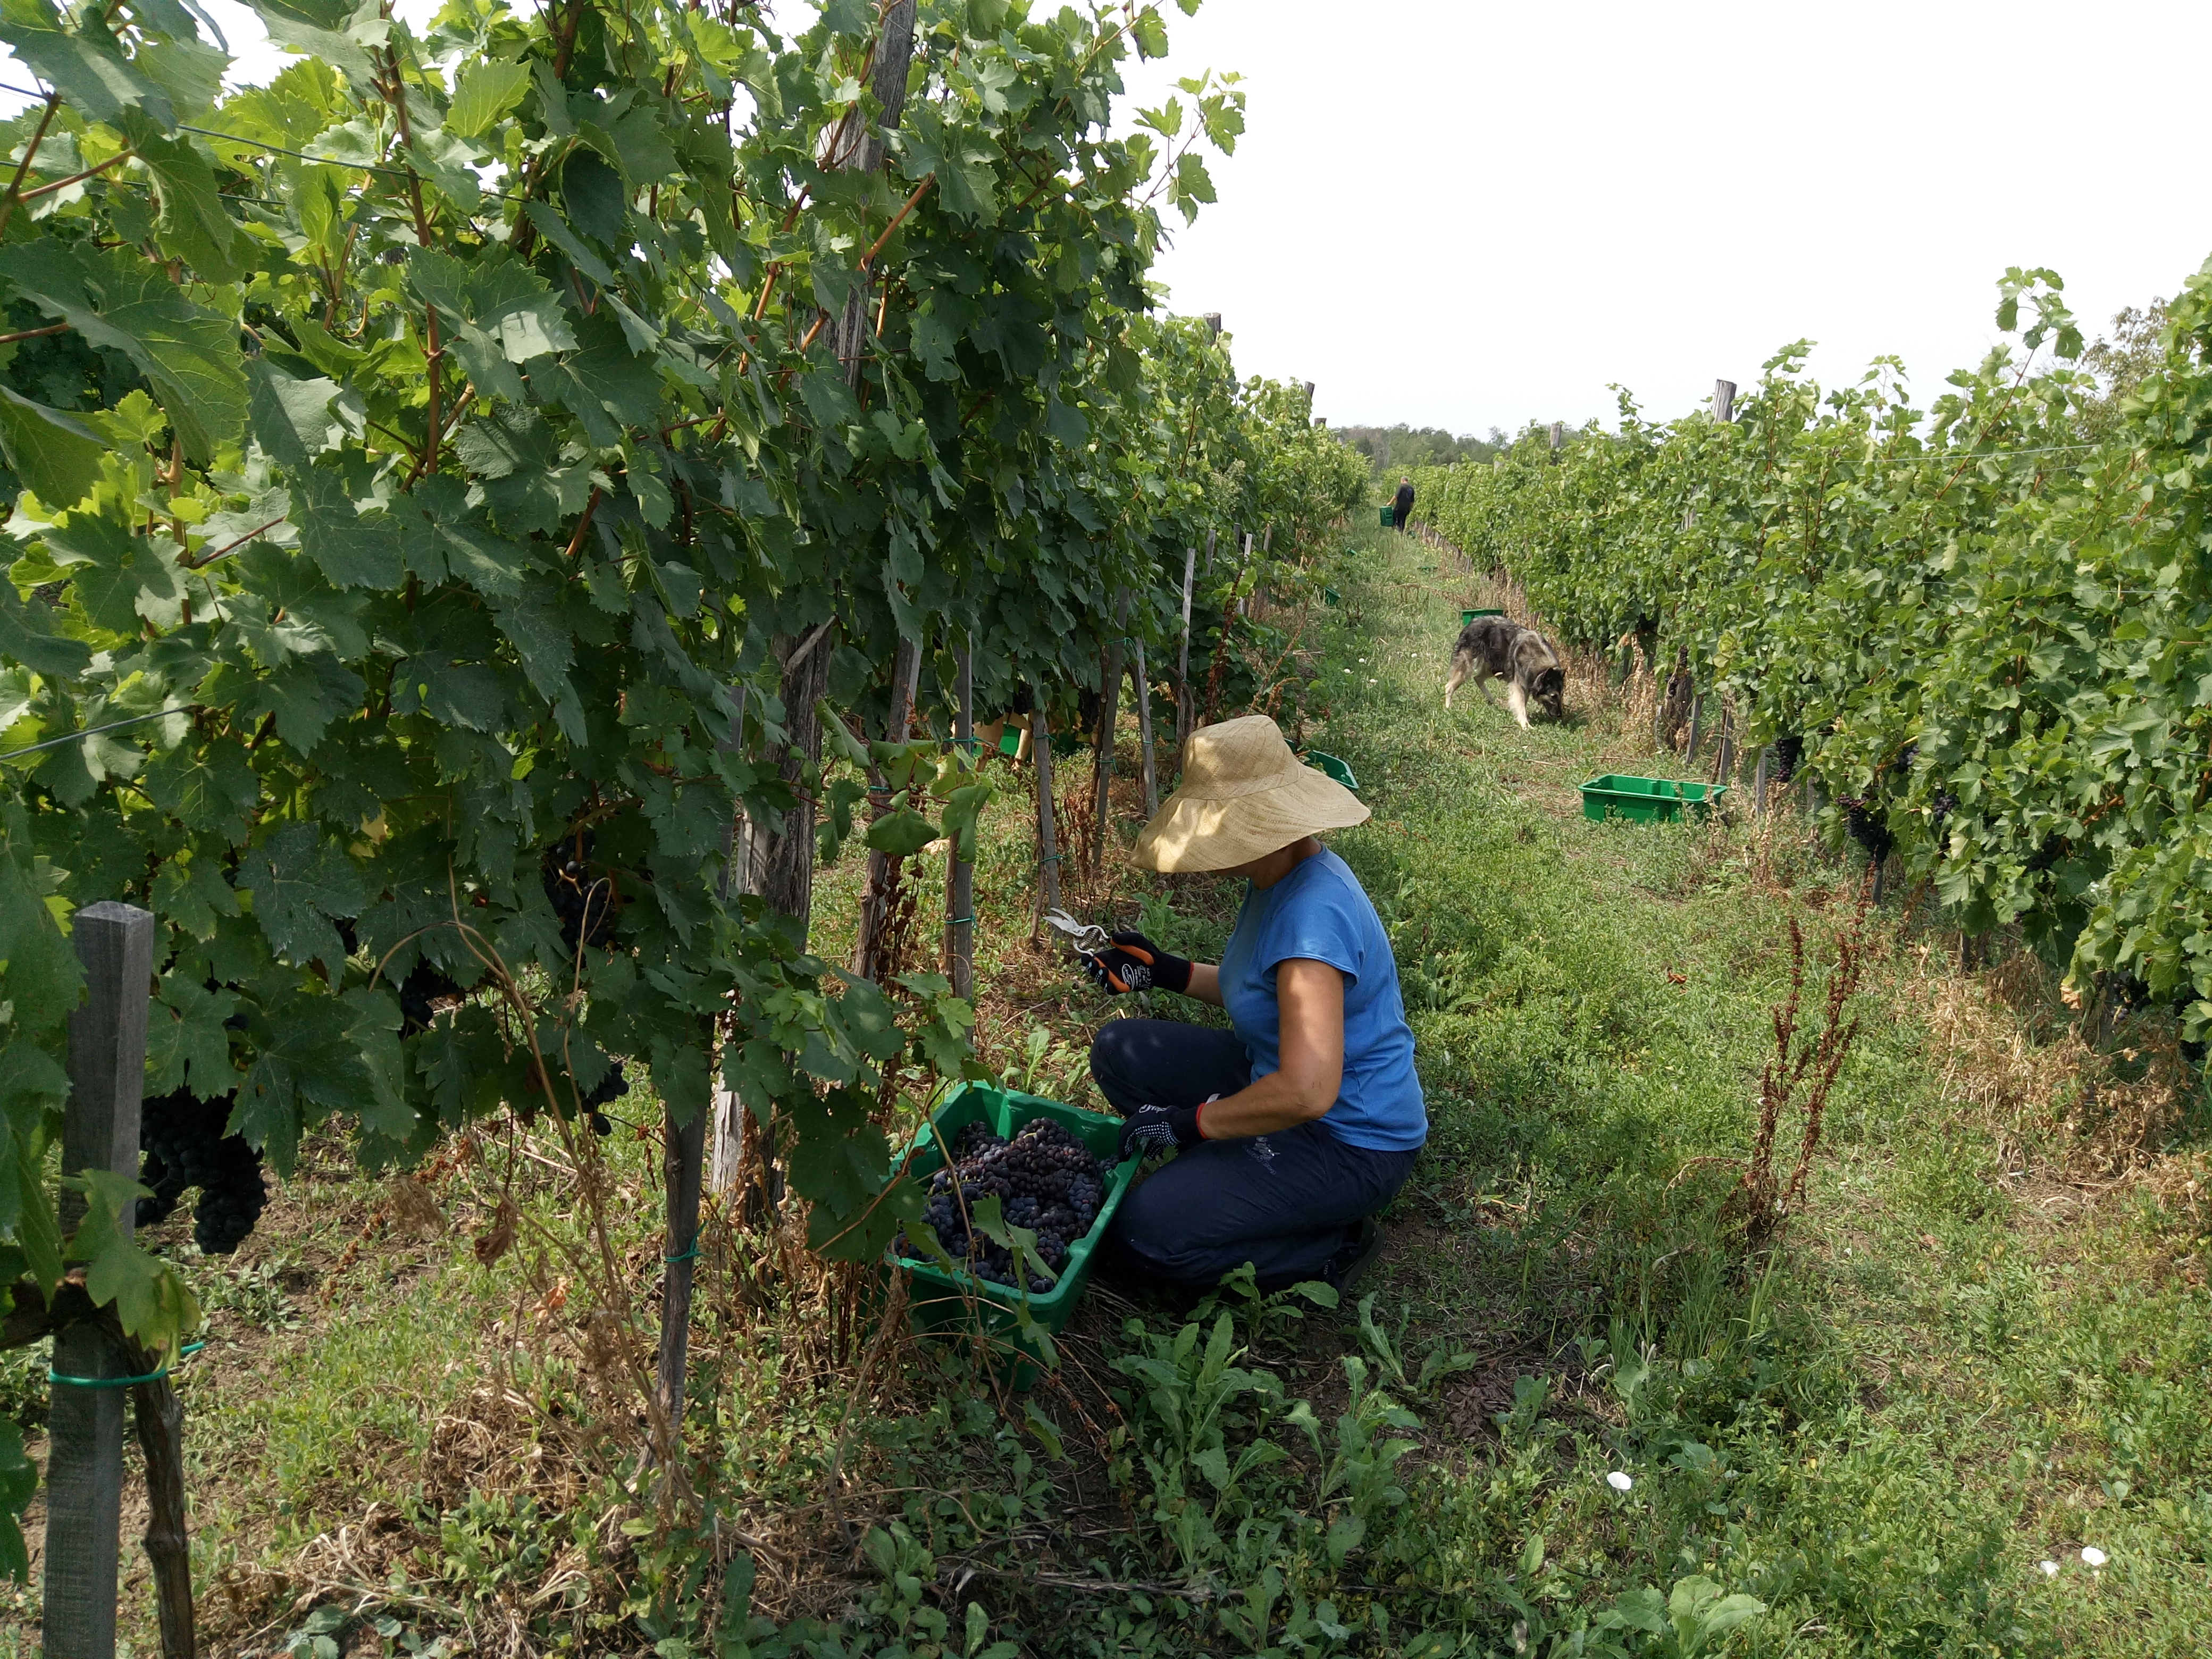 berba_grozdja_u_vinogradi_vinarije_raj